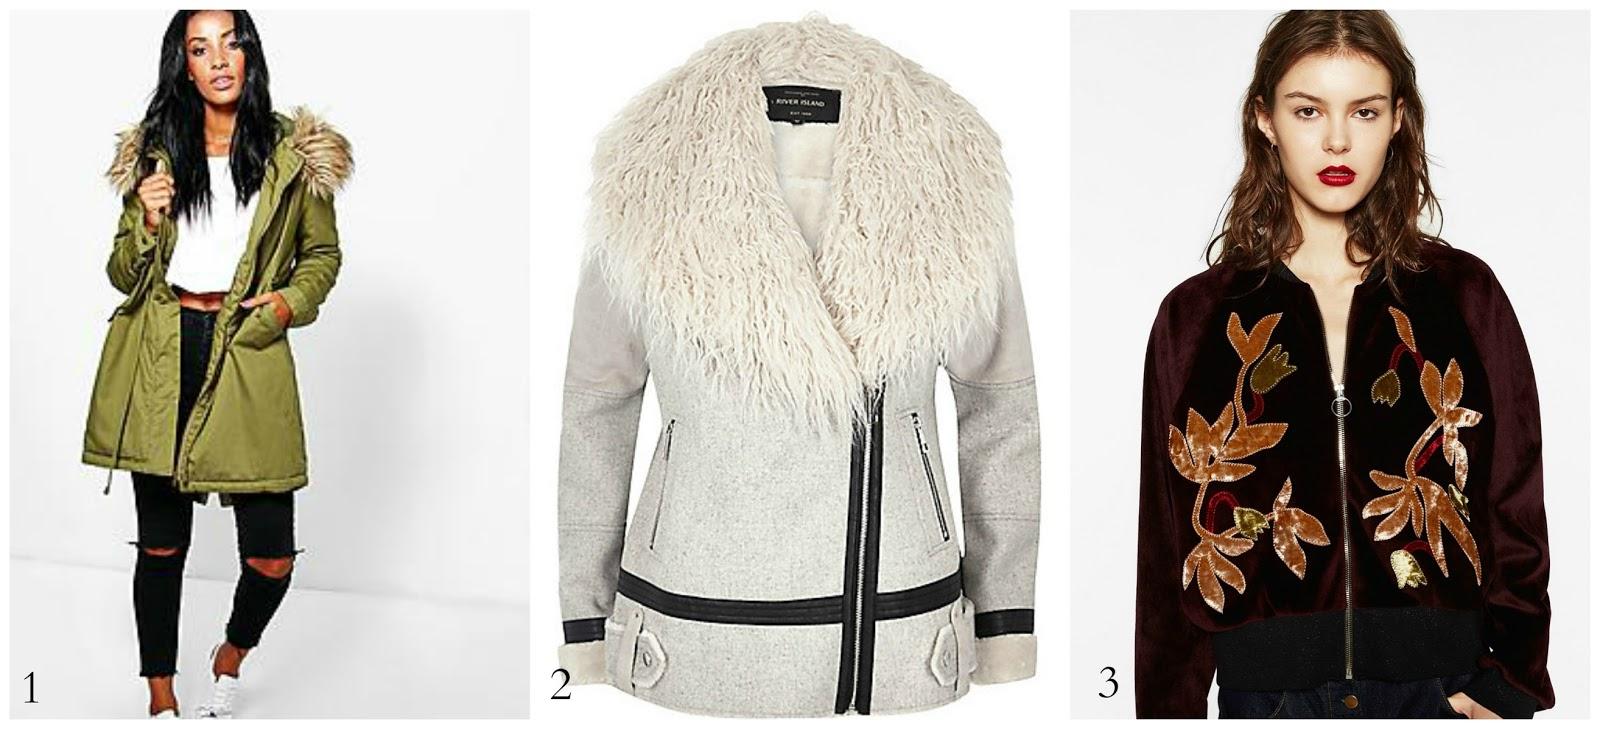 21 Winter Coats That Won't Break The Bank - 7